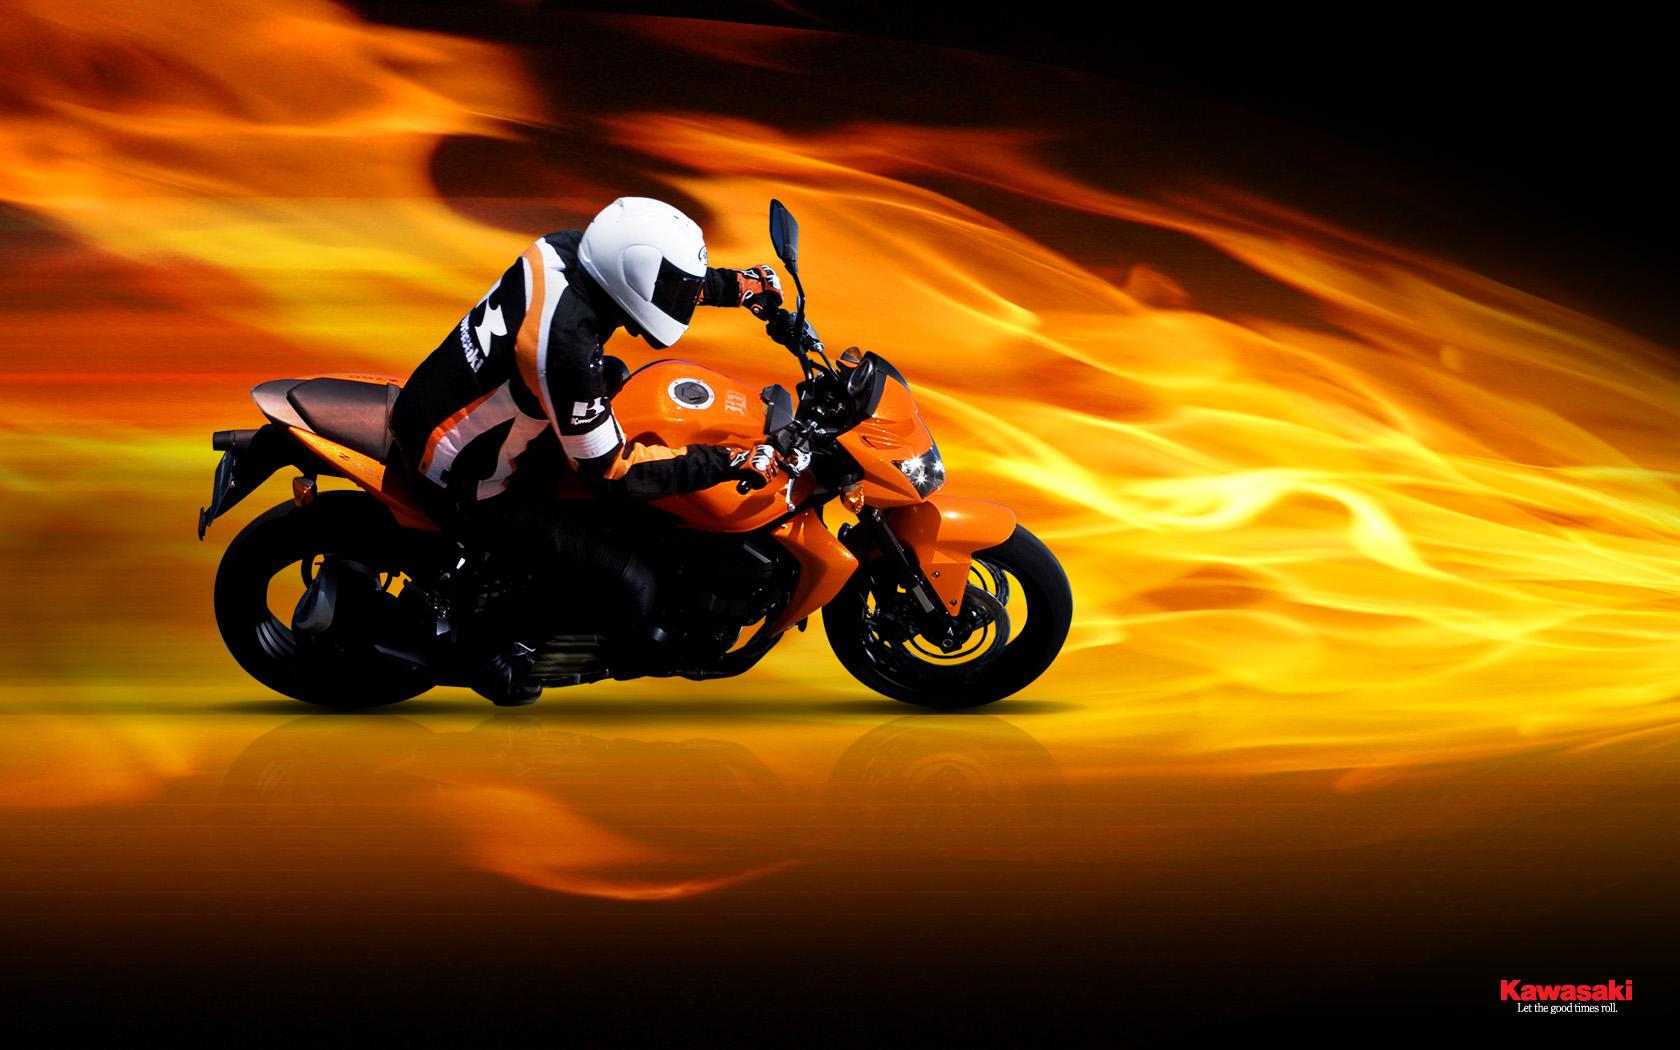 Ktm rc8 motorcycle quick shifter hm quickshifter australia - The Great Motorcycle Of Kawasaki Z 750